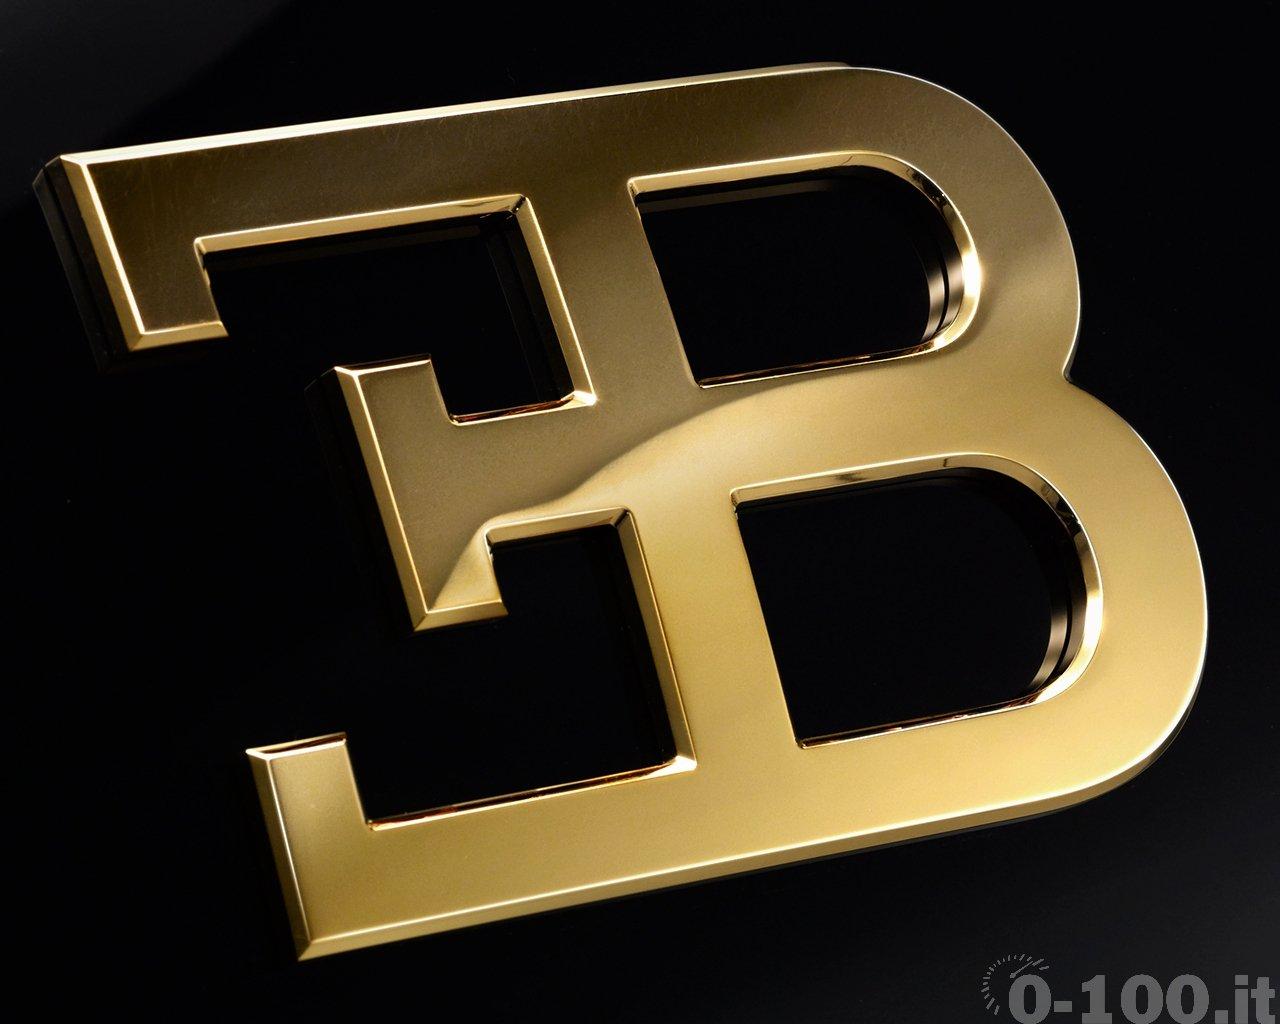 beijing-2014-bugatti-veyron-serie-speciale-les-legendes-de-bugatti-veyron-16-4-grand-sport-vitesse-black-bess_23